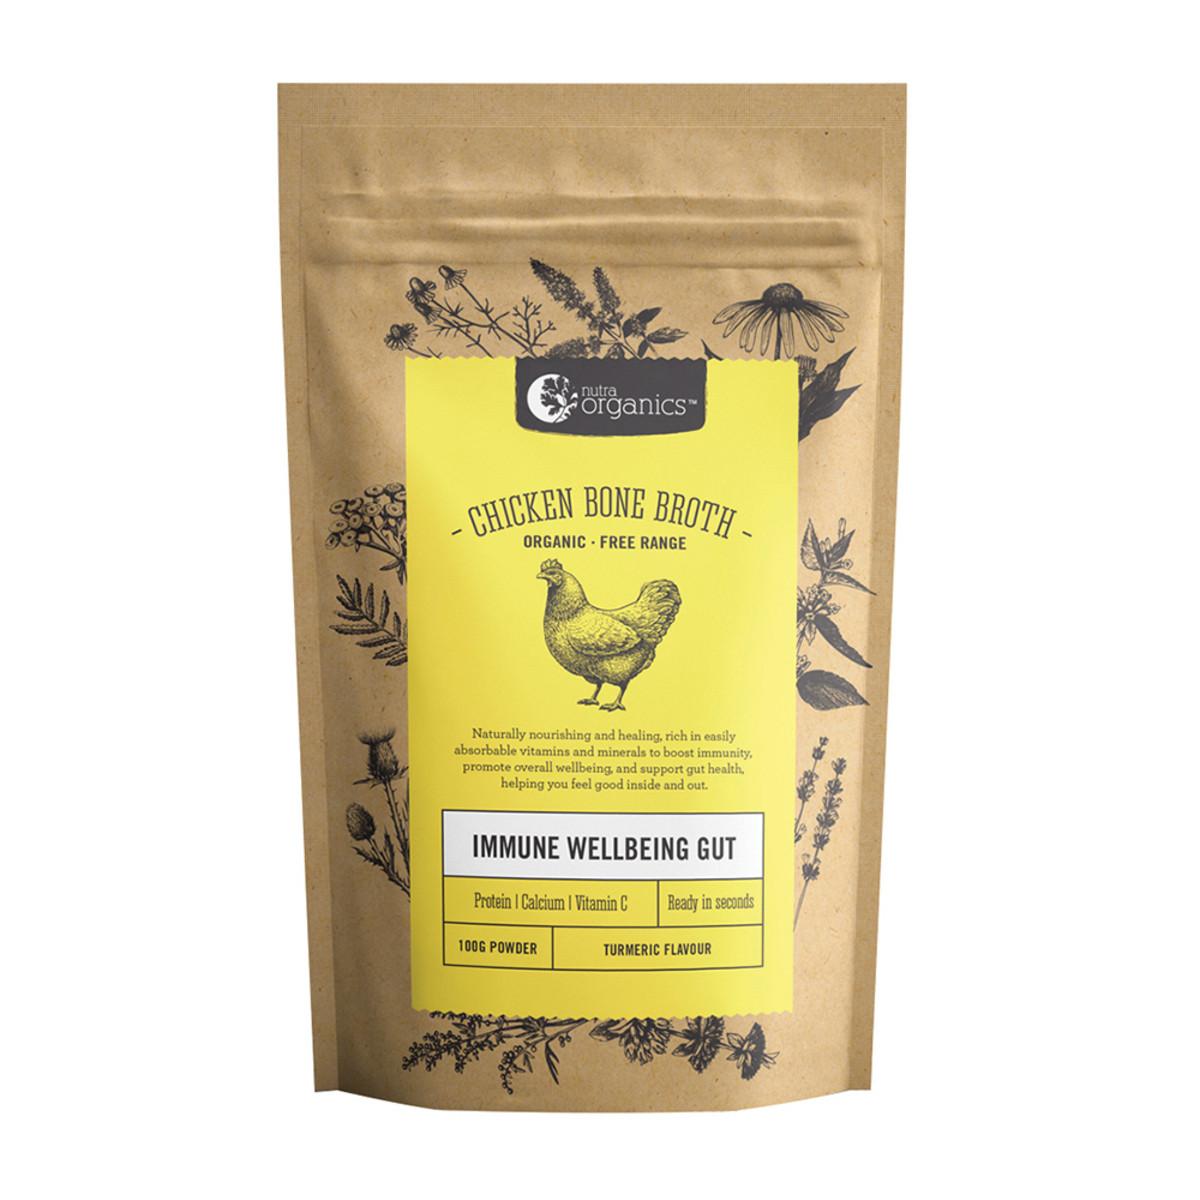 Nutra Org Bone Broth Chicken Organic Turmeric 100g_media-01